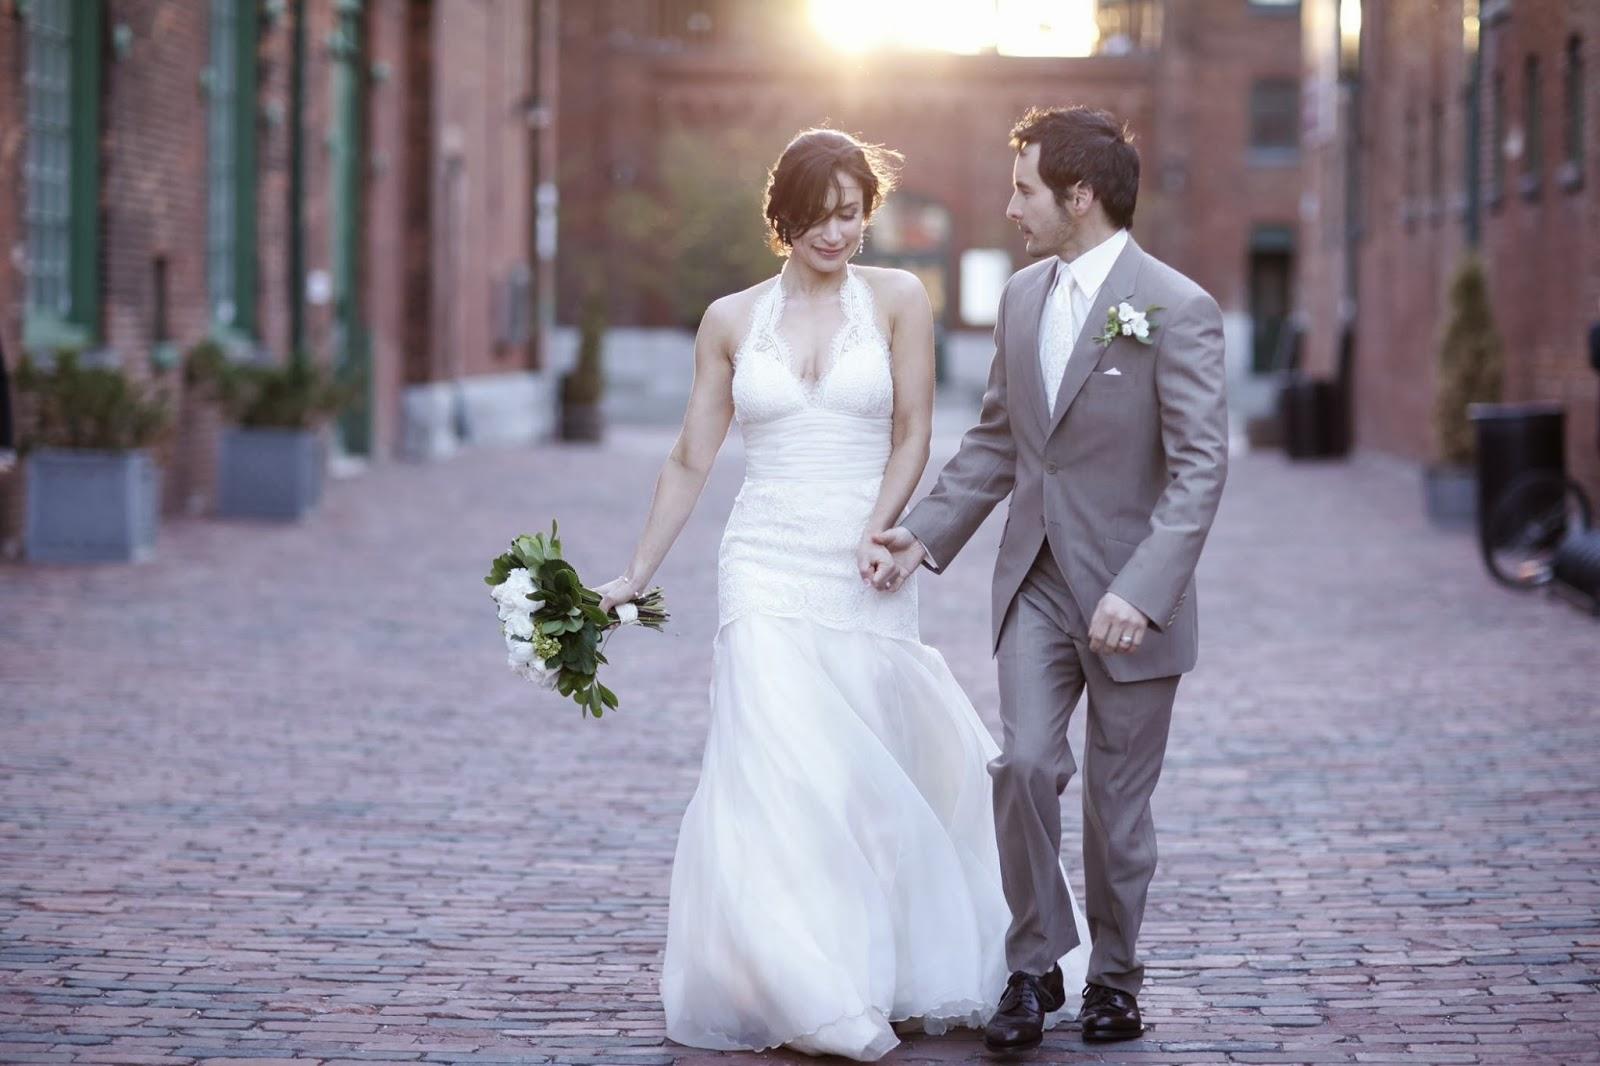 Image: Cynthia Loyst and her husband Jason